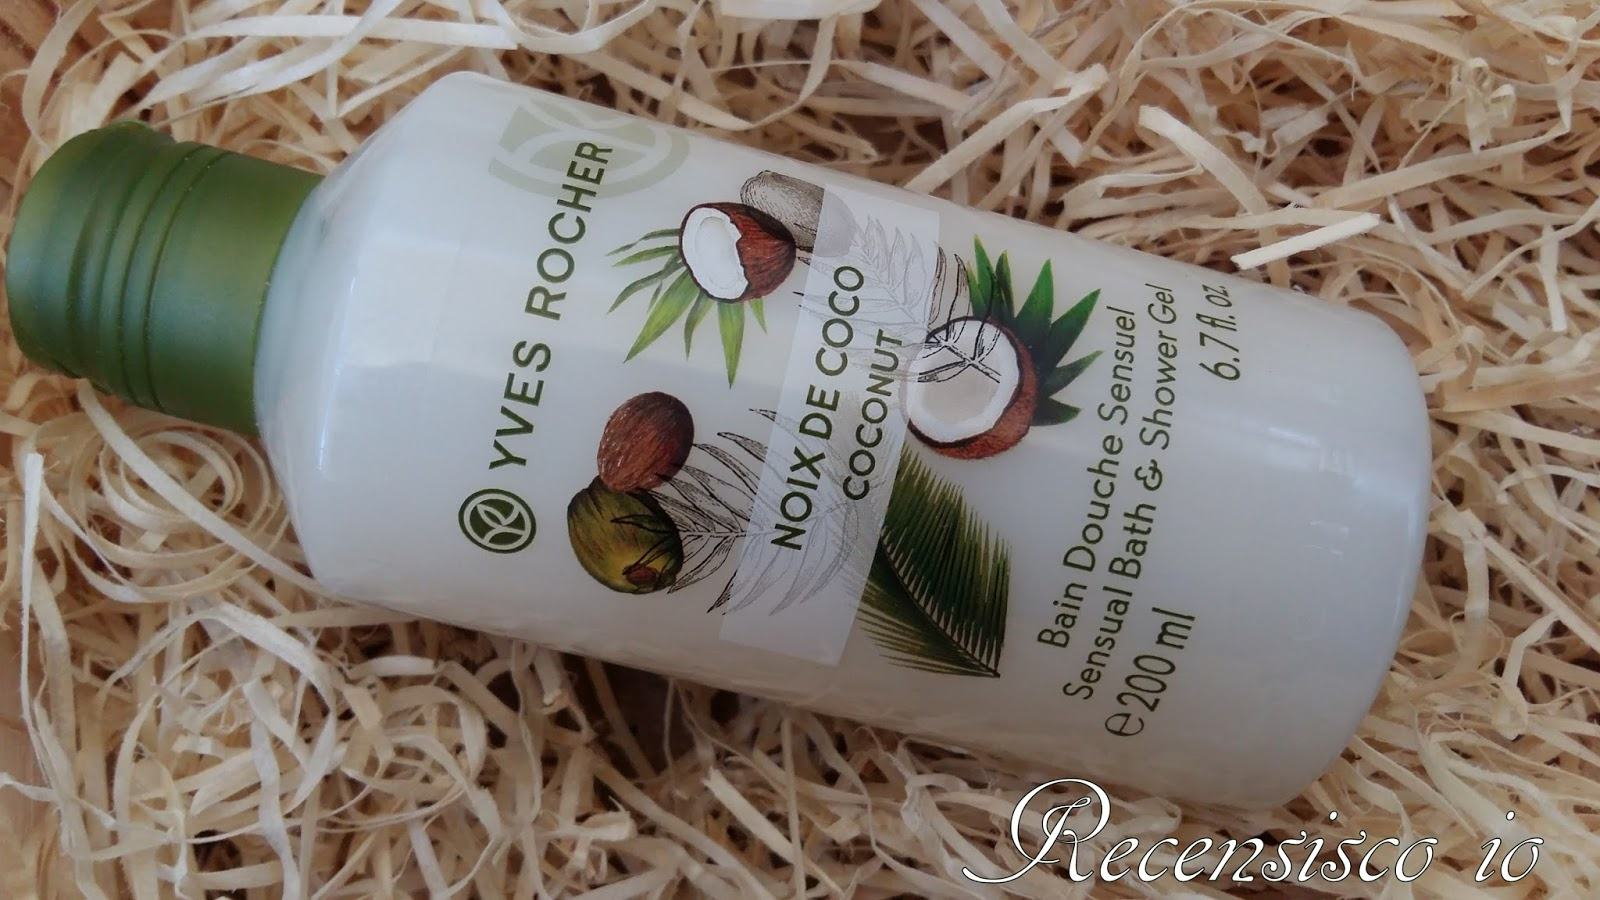 Bagno Doccia Avena Yves Rocher : Bagno doccia yves rocher vaniglia